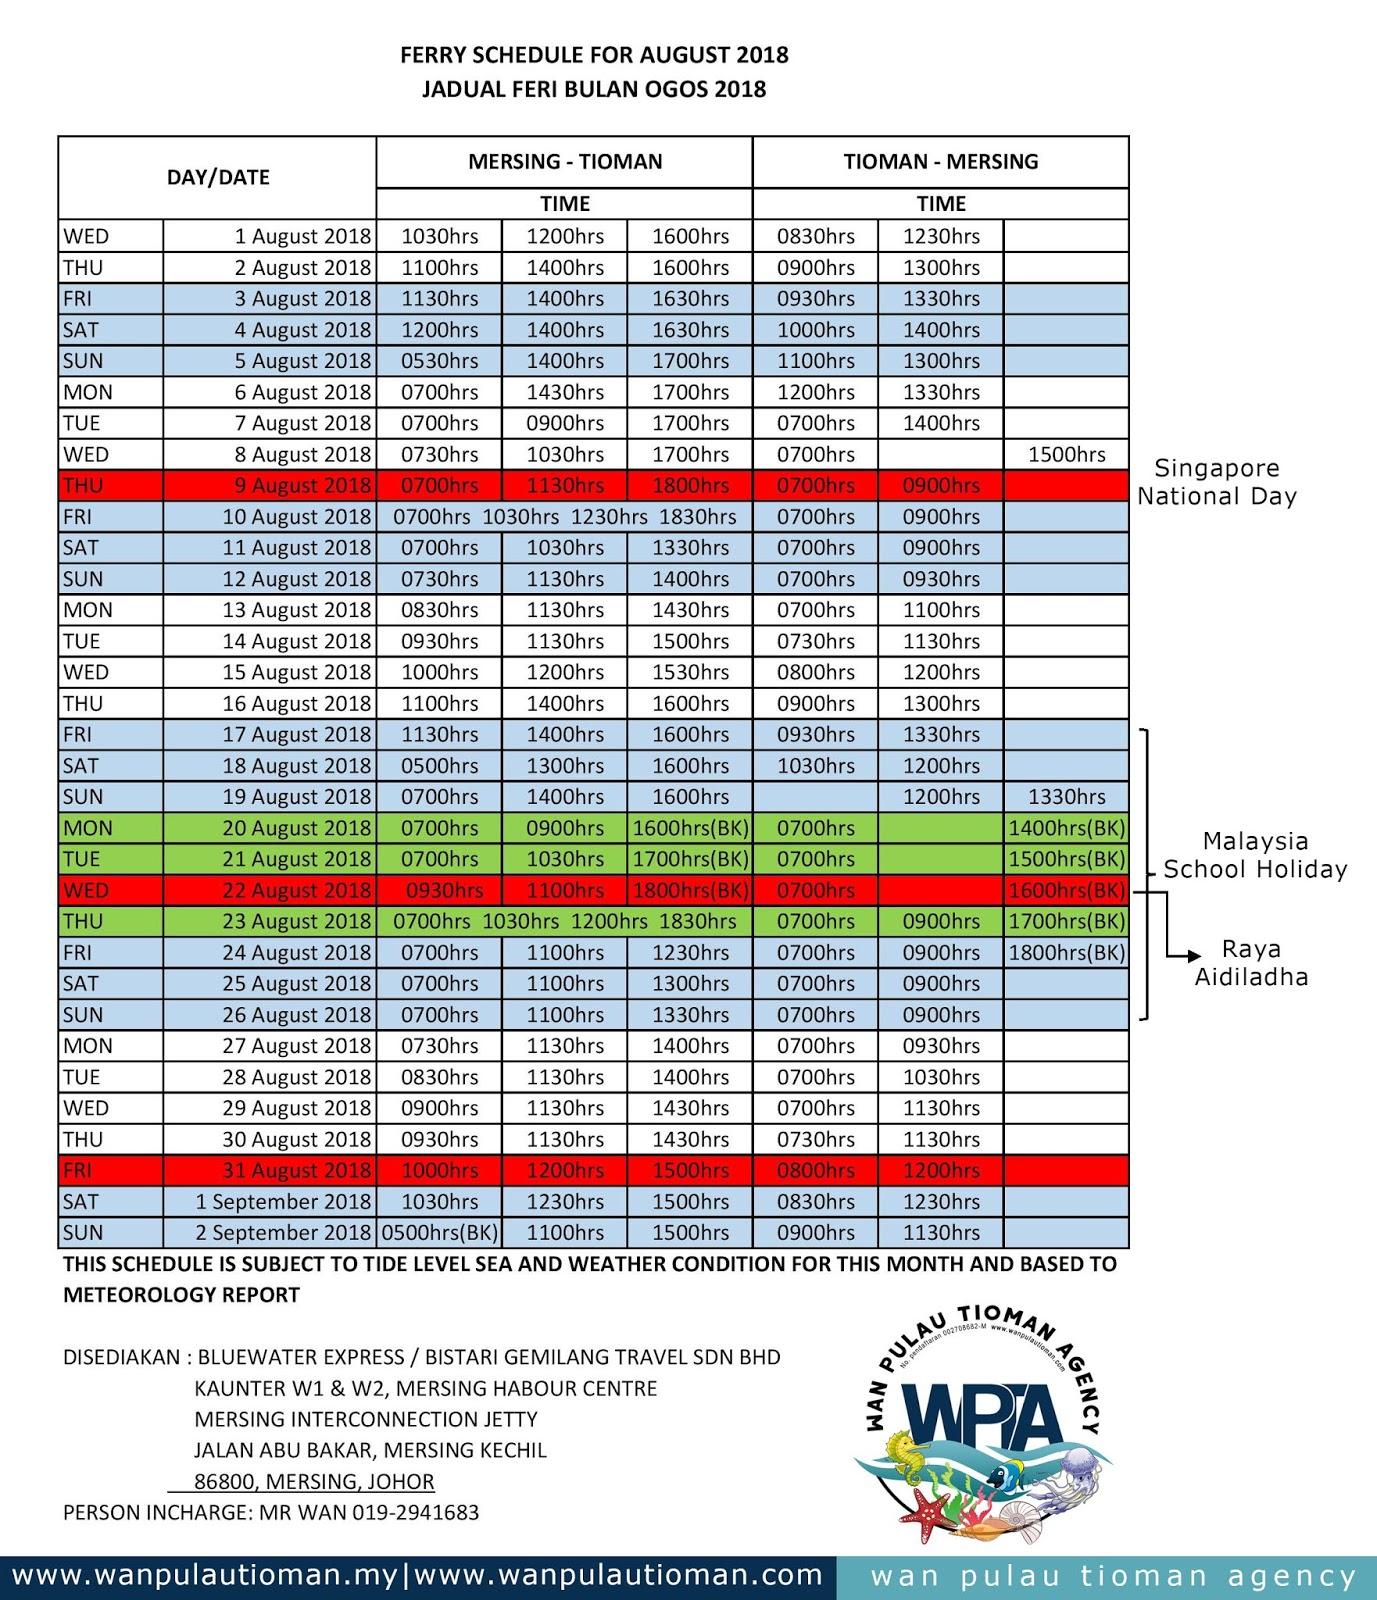 Tioman Ferry Transfer Schedule August 2018